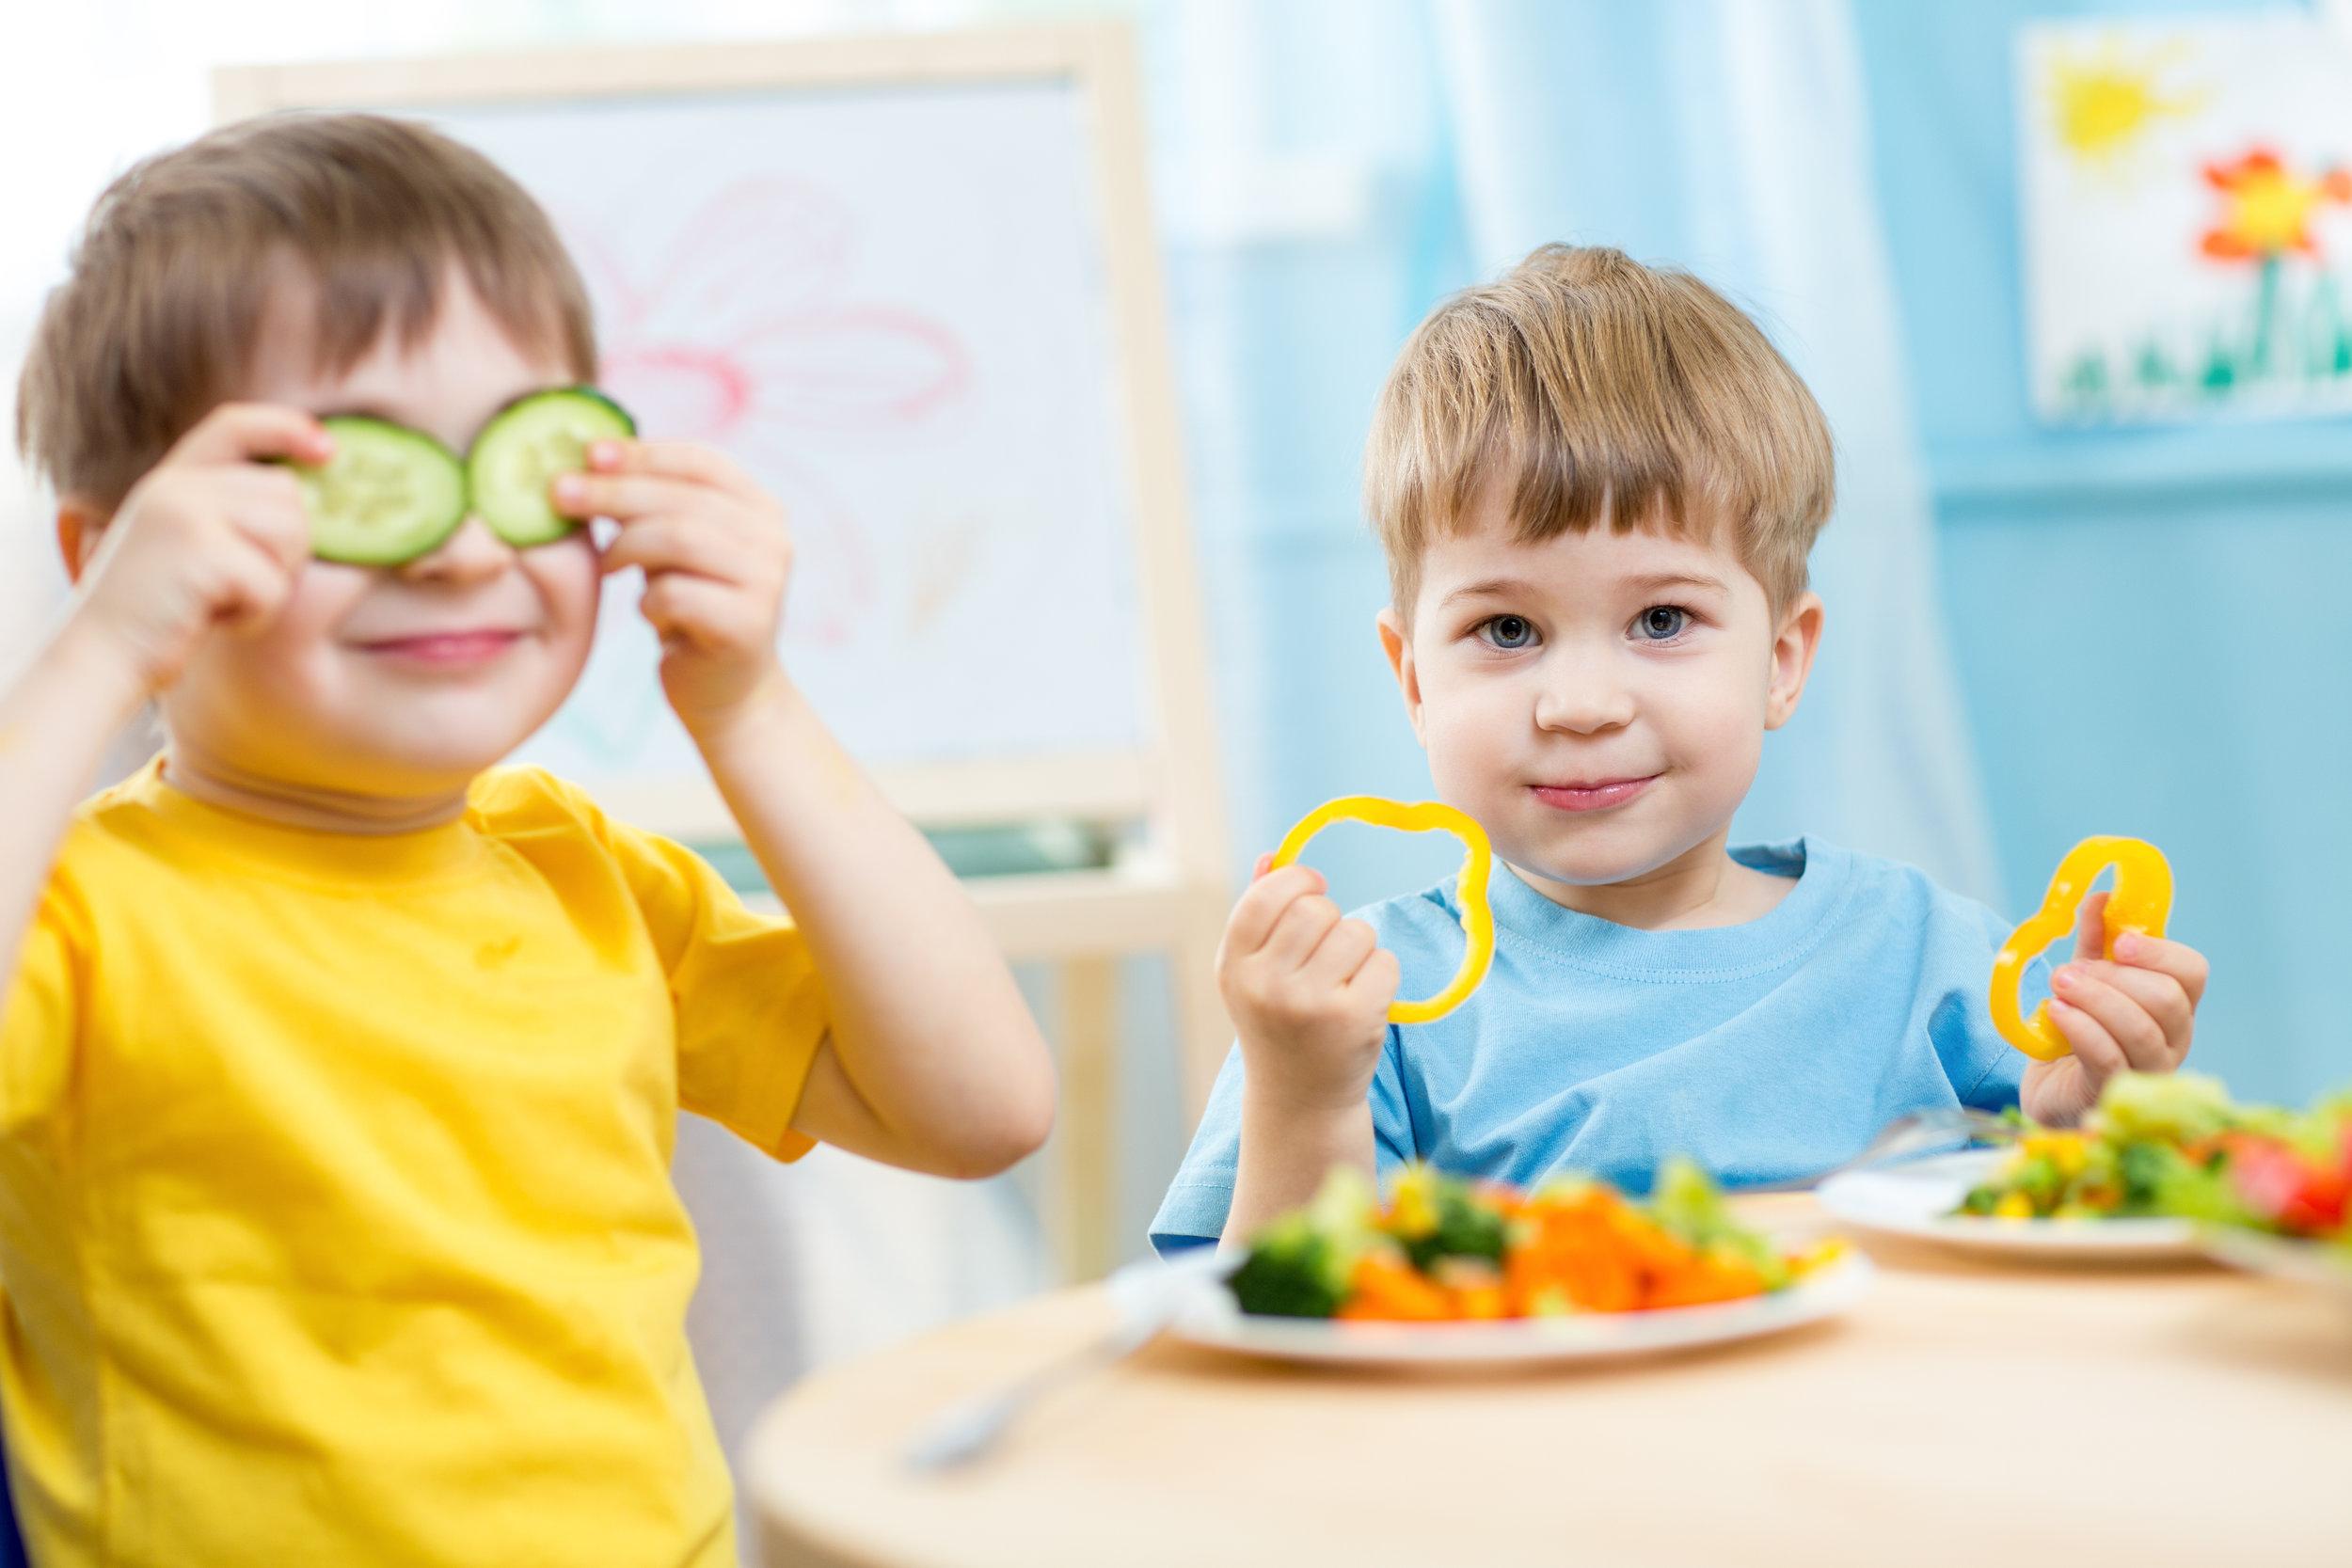 Healthy Food, Happy Kids, Bright Futures